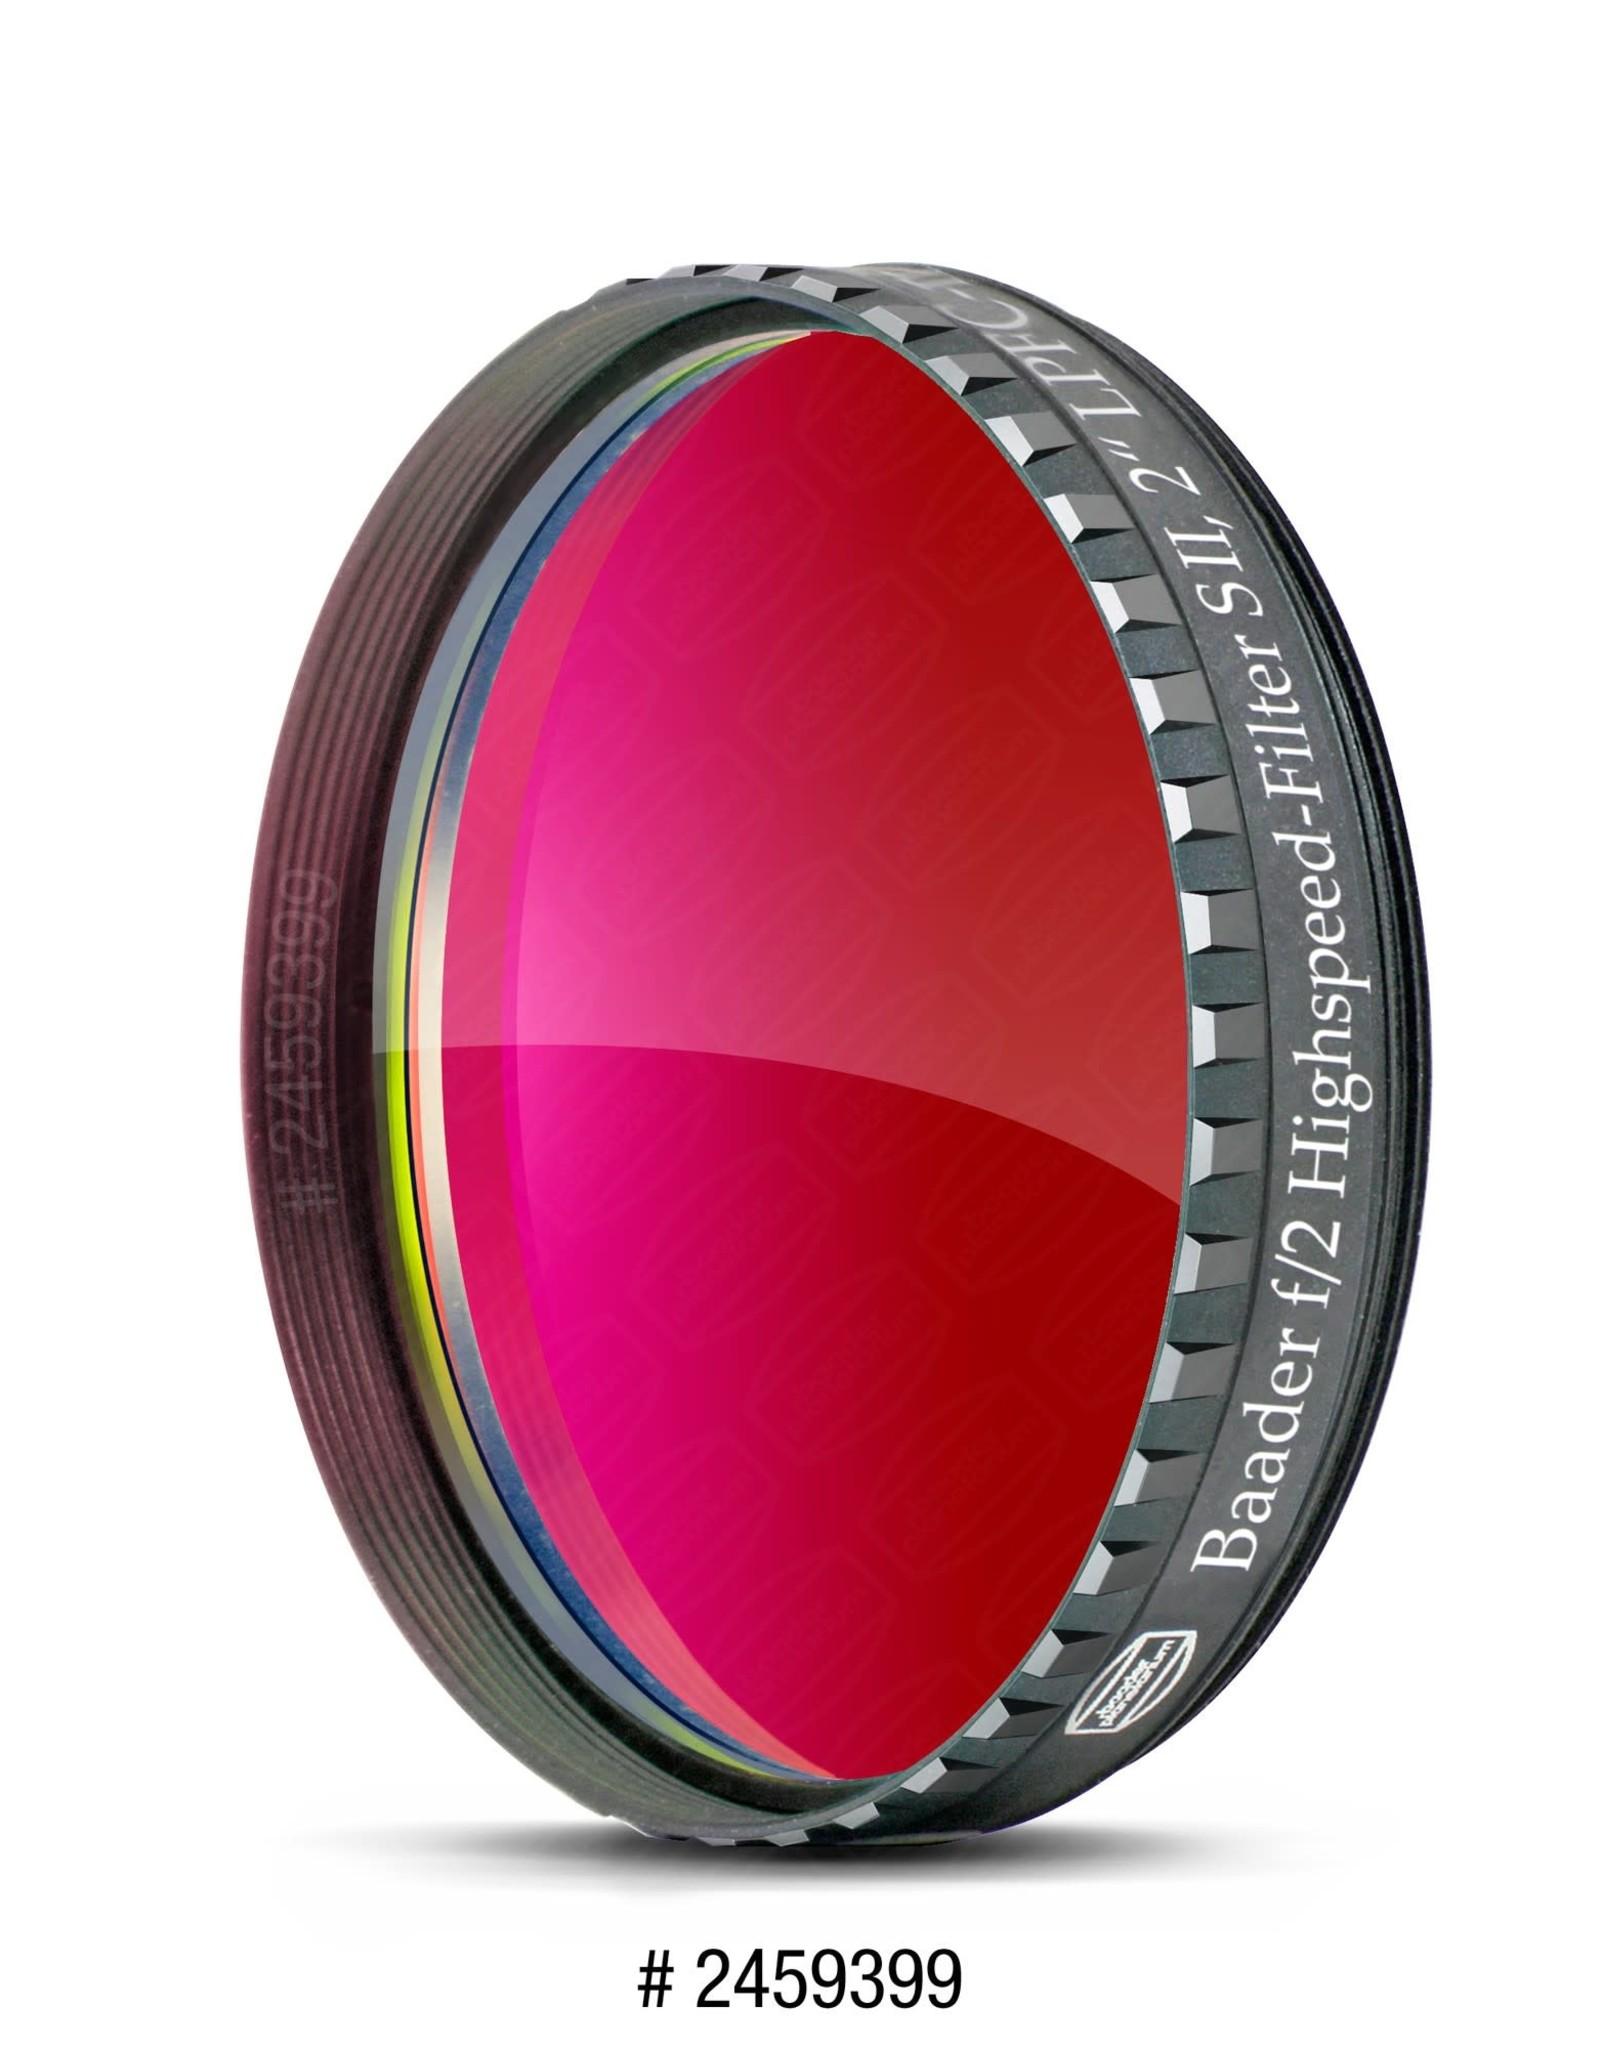 Baader Planetarium Baader f/2 Highspeed-Filters/ SII (Specify Size)